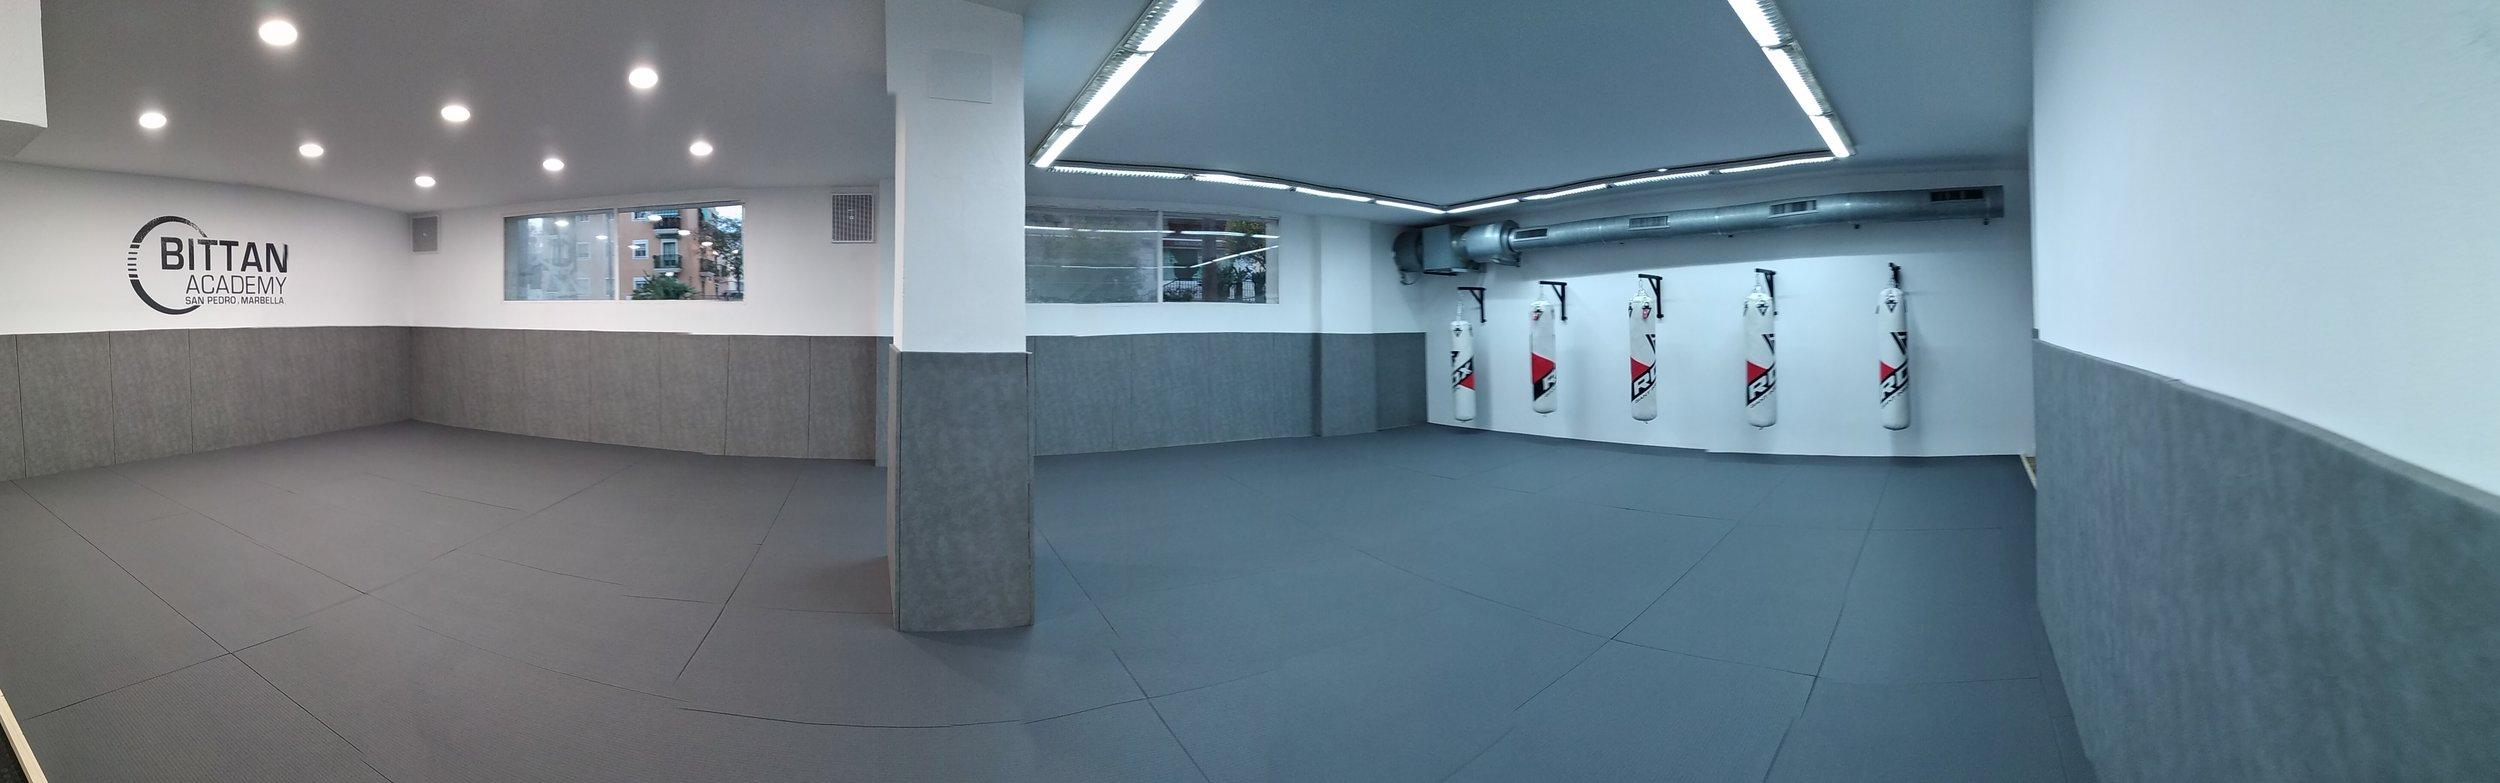 150m2 de tatami olimpico japonés -